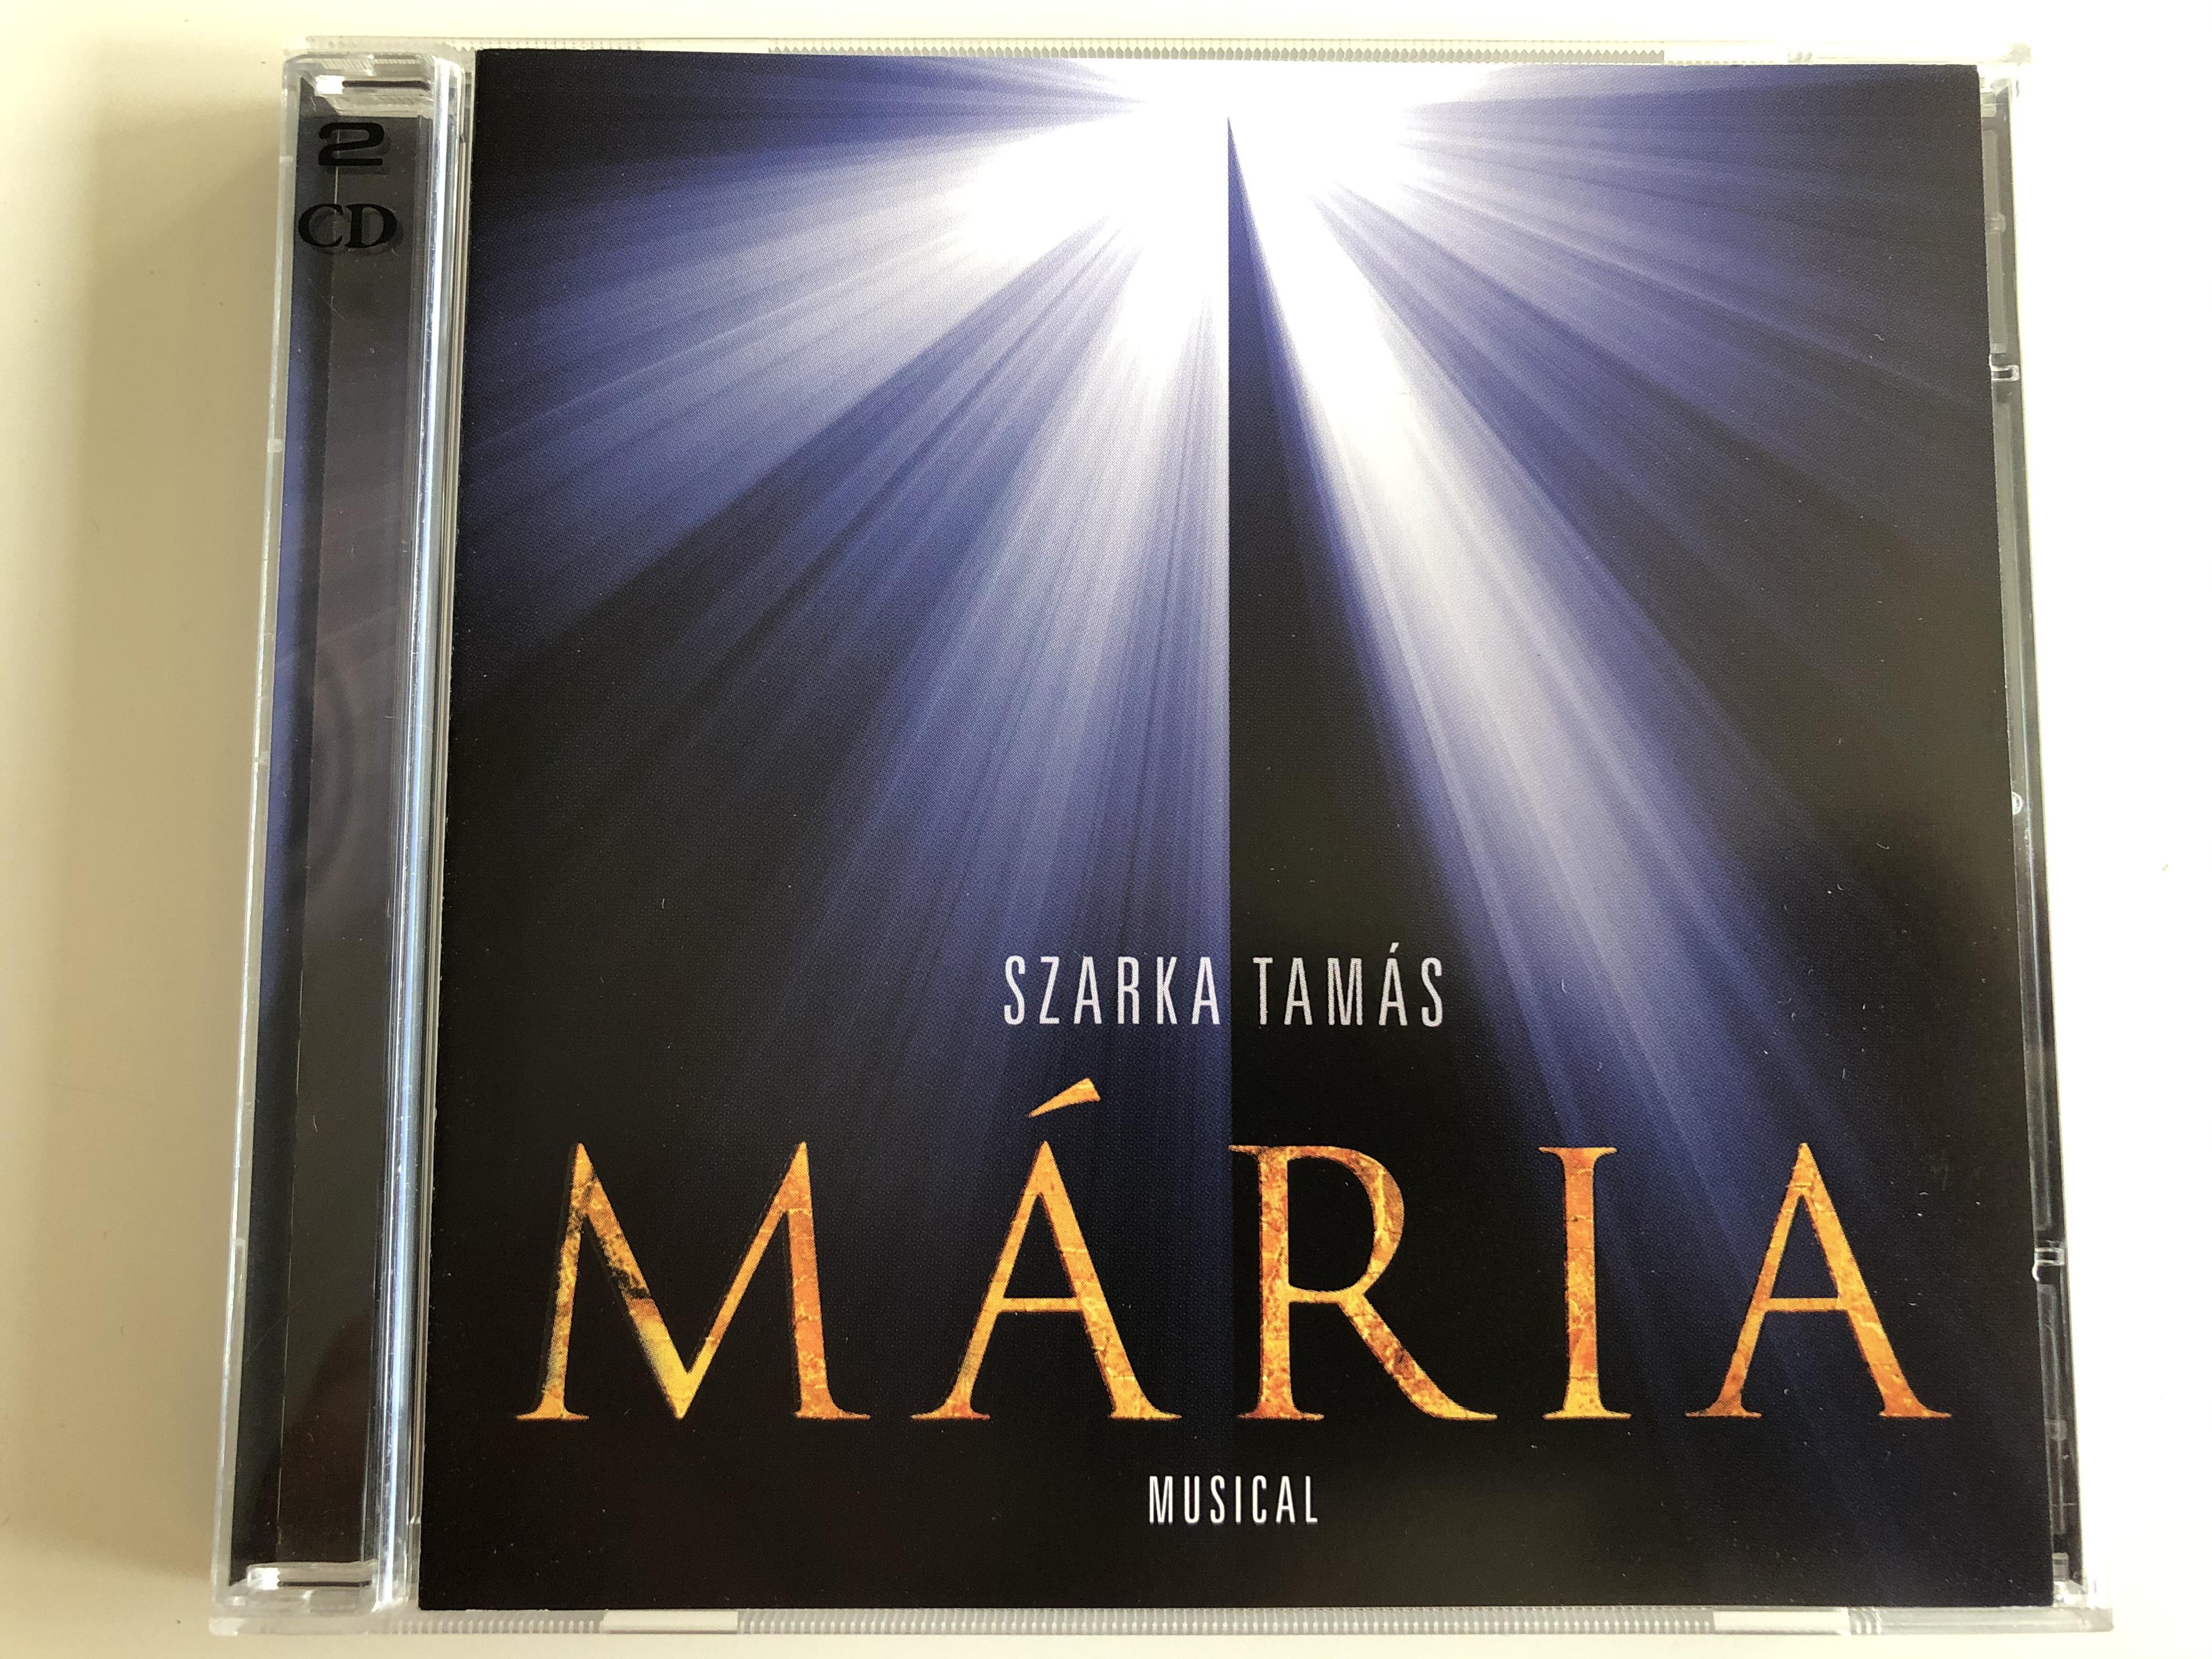 szarka-tamas-maria-musical-magneoton-2x-audio-cd-2012-5999885533046-1-.jpg